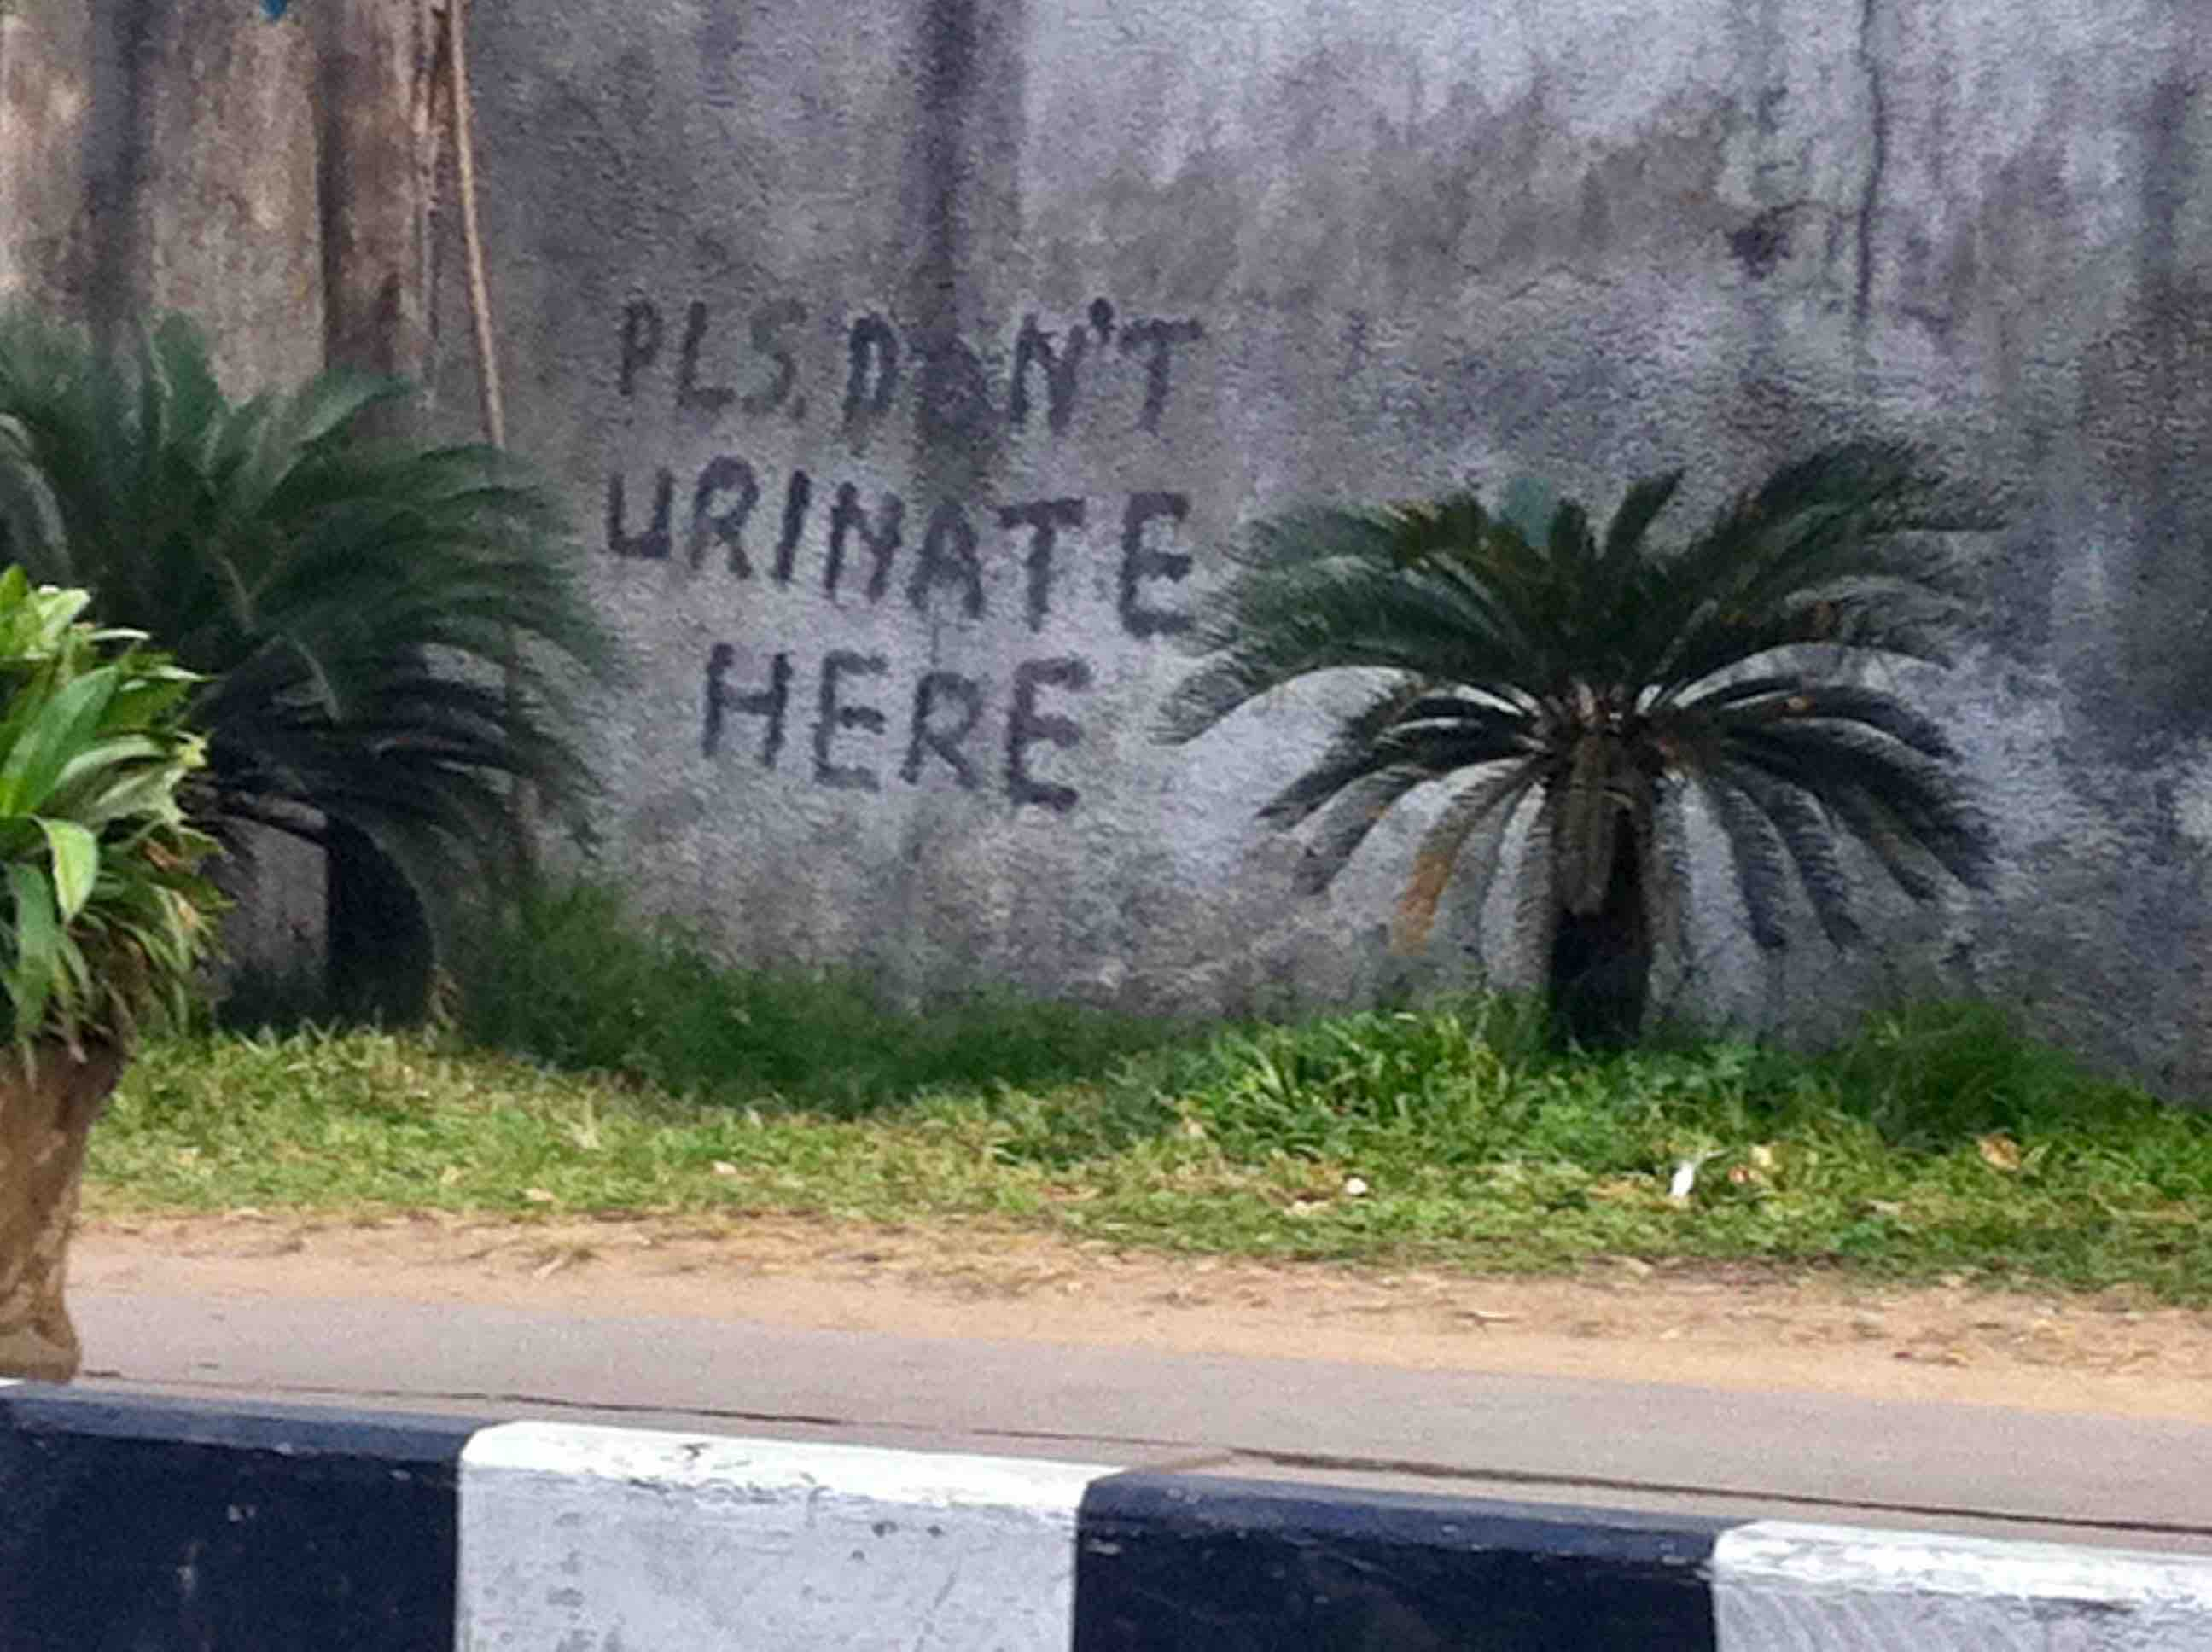 Public Urination, Broad Street, Lagos Island, Nigeria. #JujuFilms